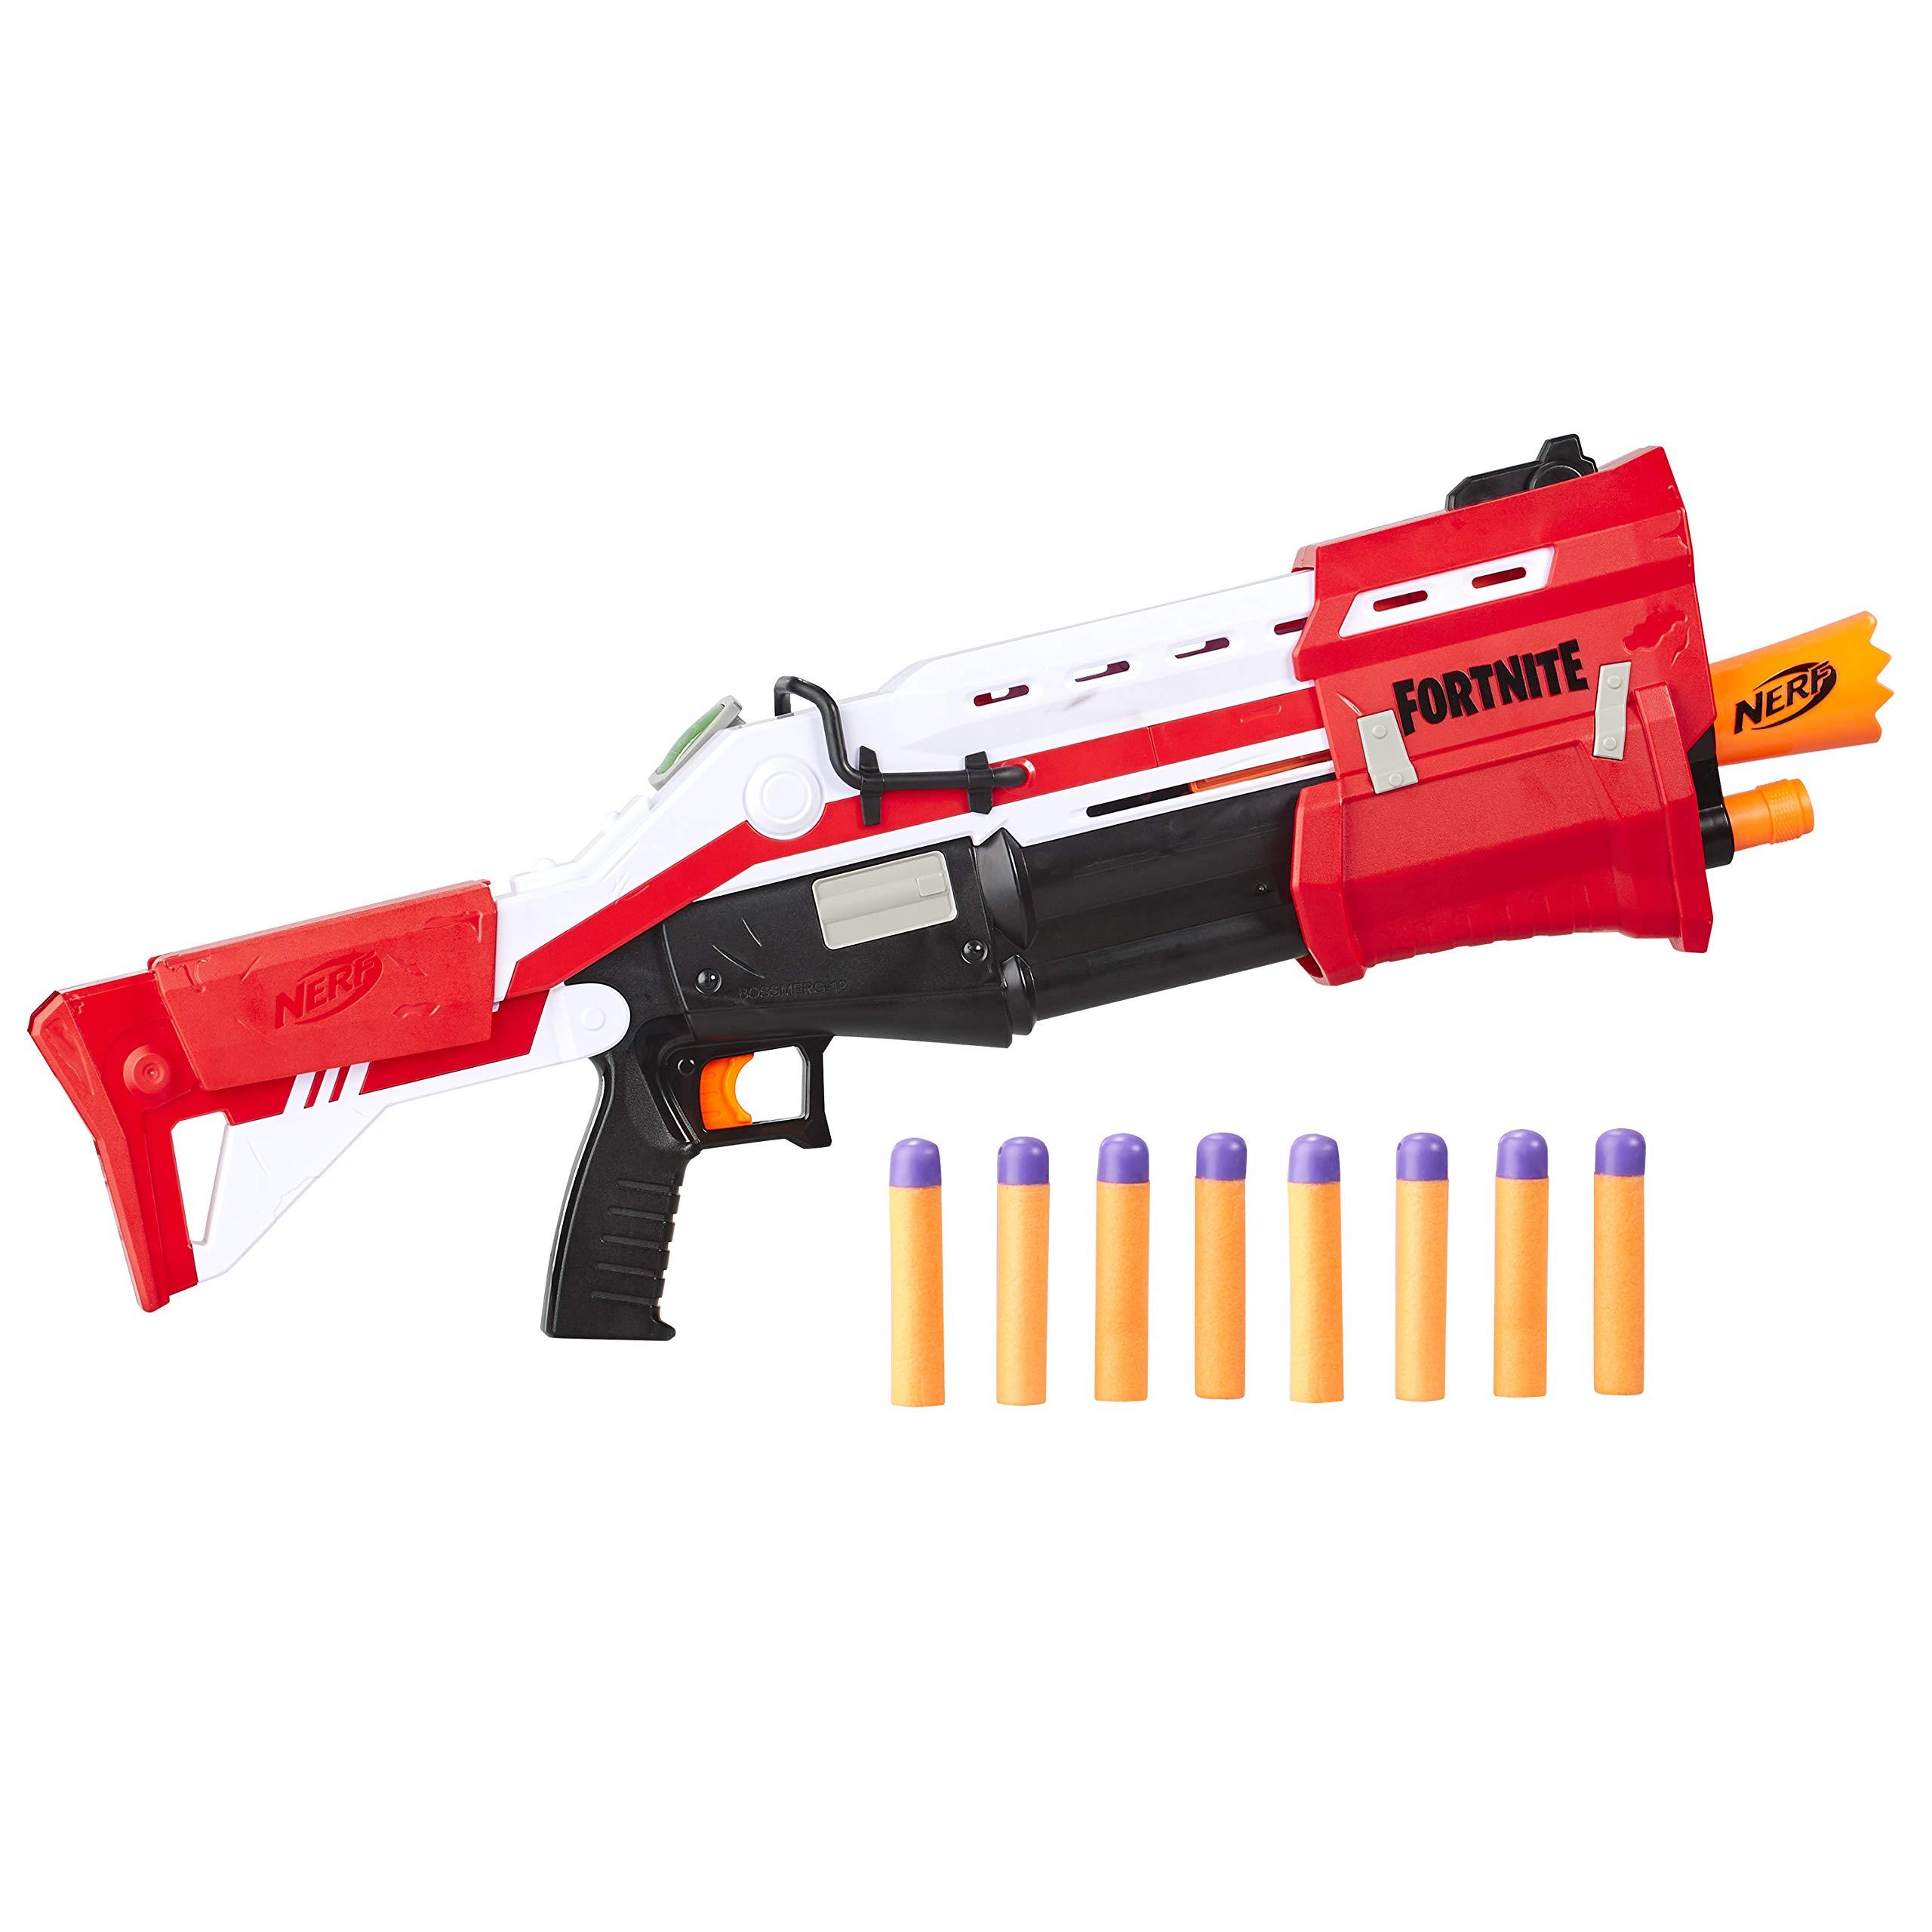 Nerf Fortnite TS-1 Blaster by NERF (Image #3)